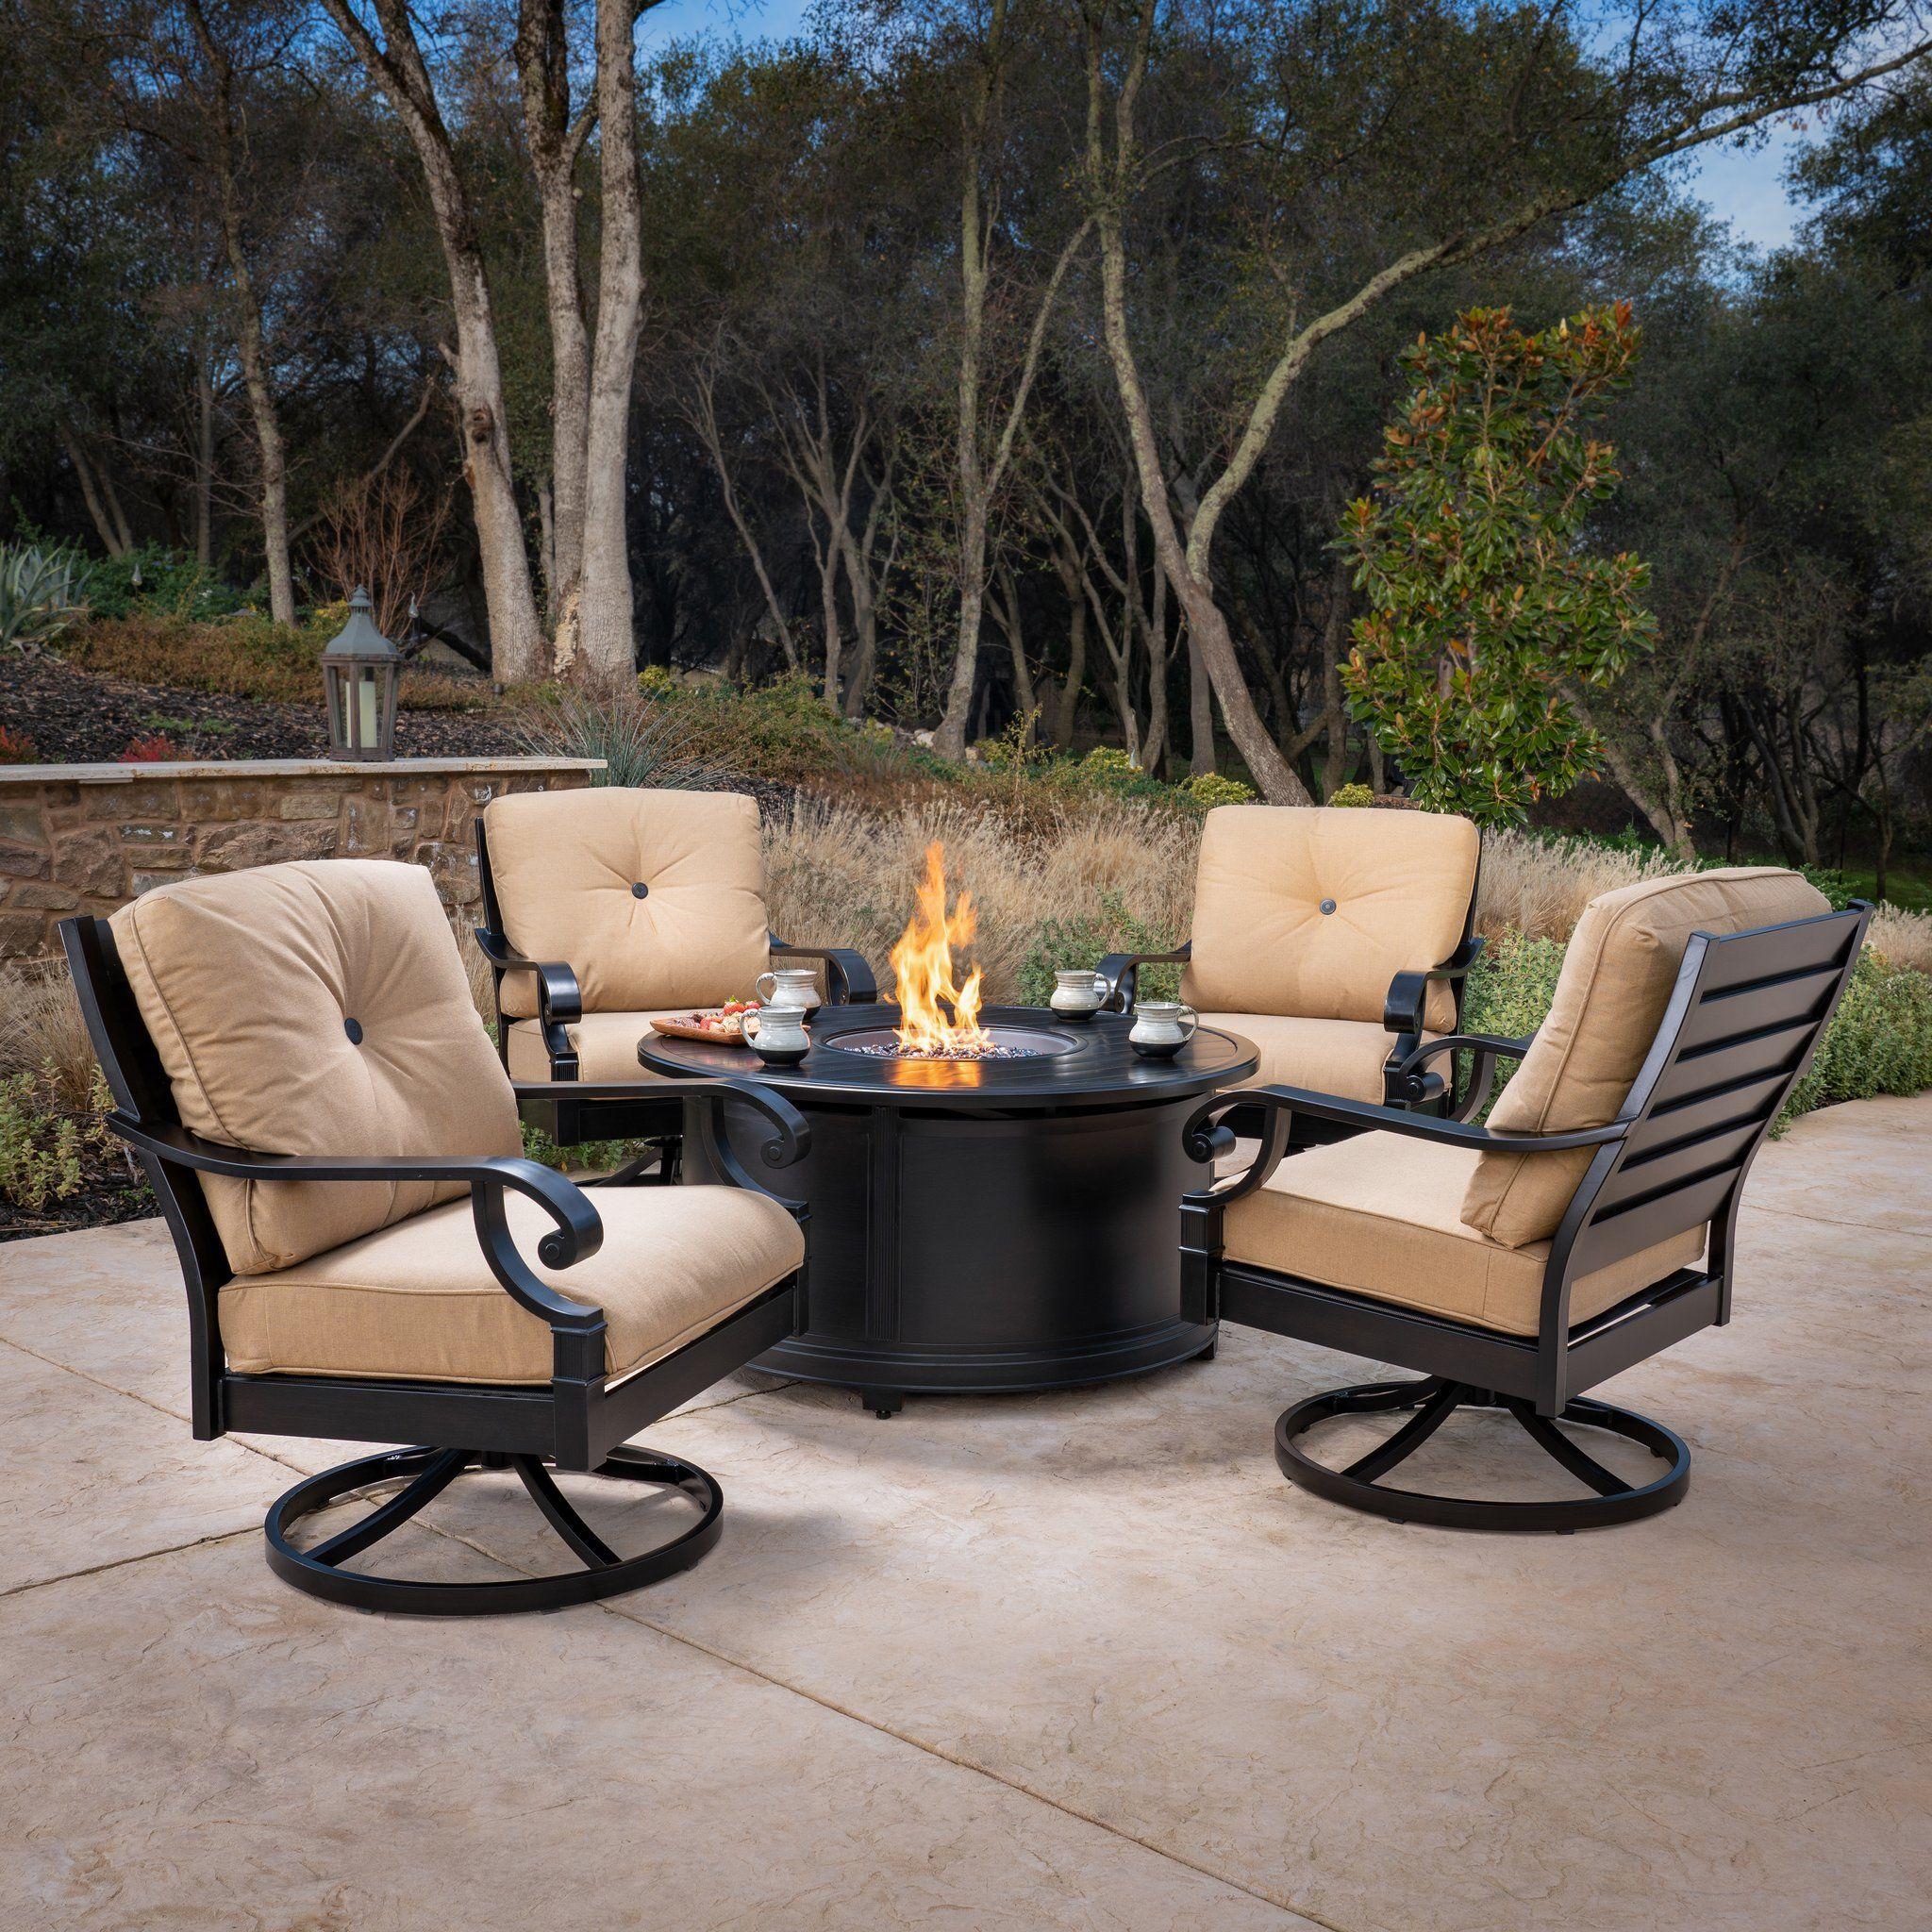 Verena 2pk Swivel Rocker Lounge Chairs Costco patio